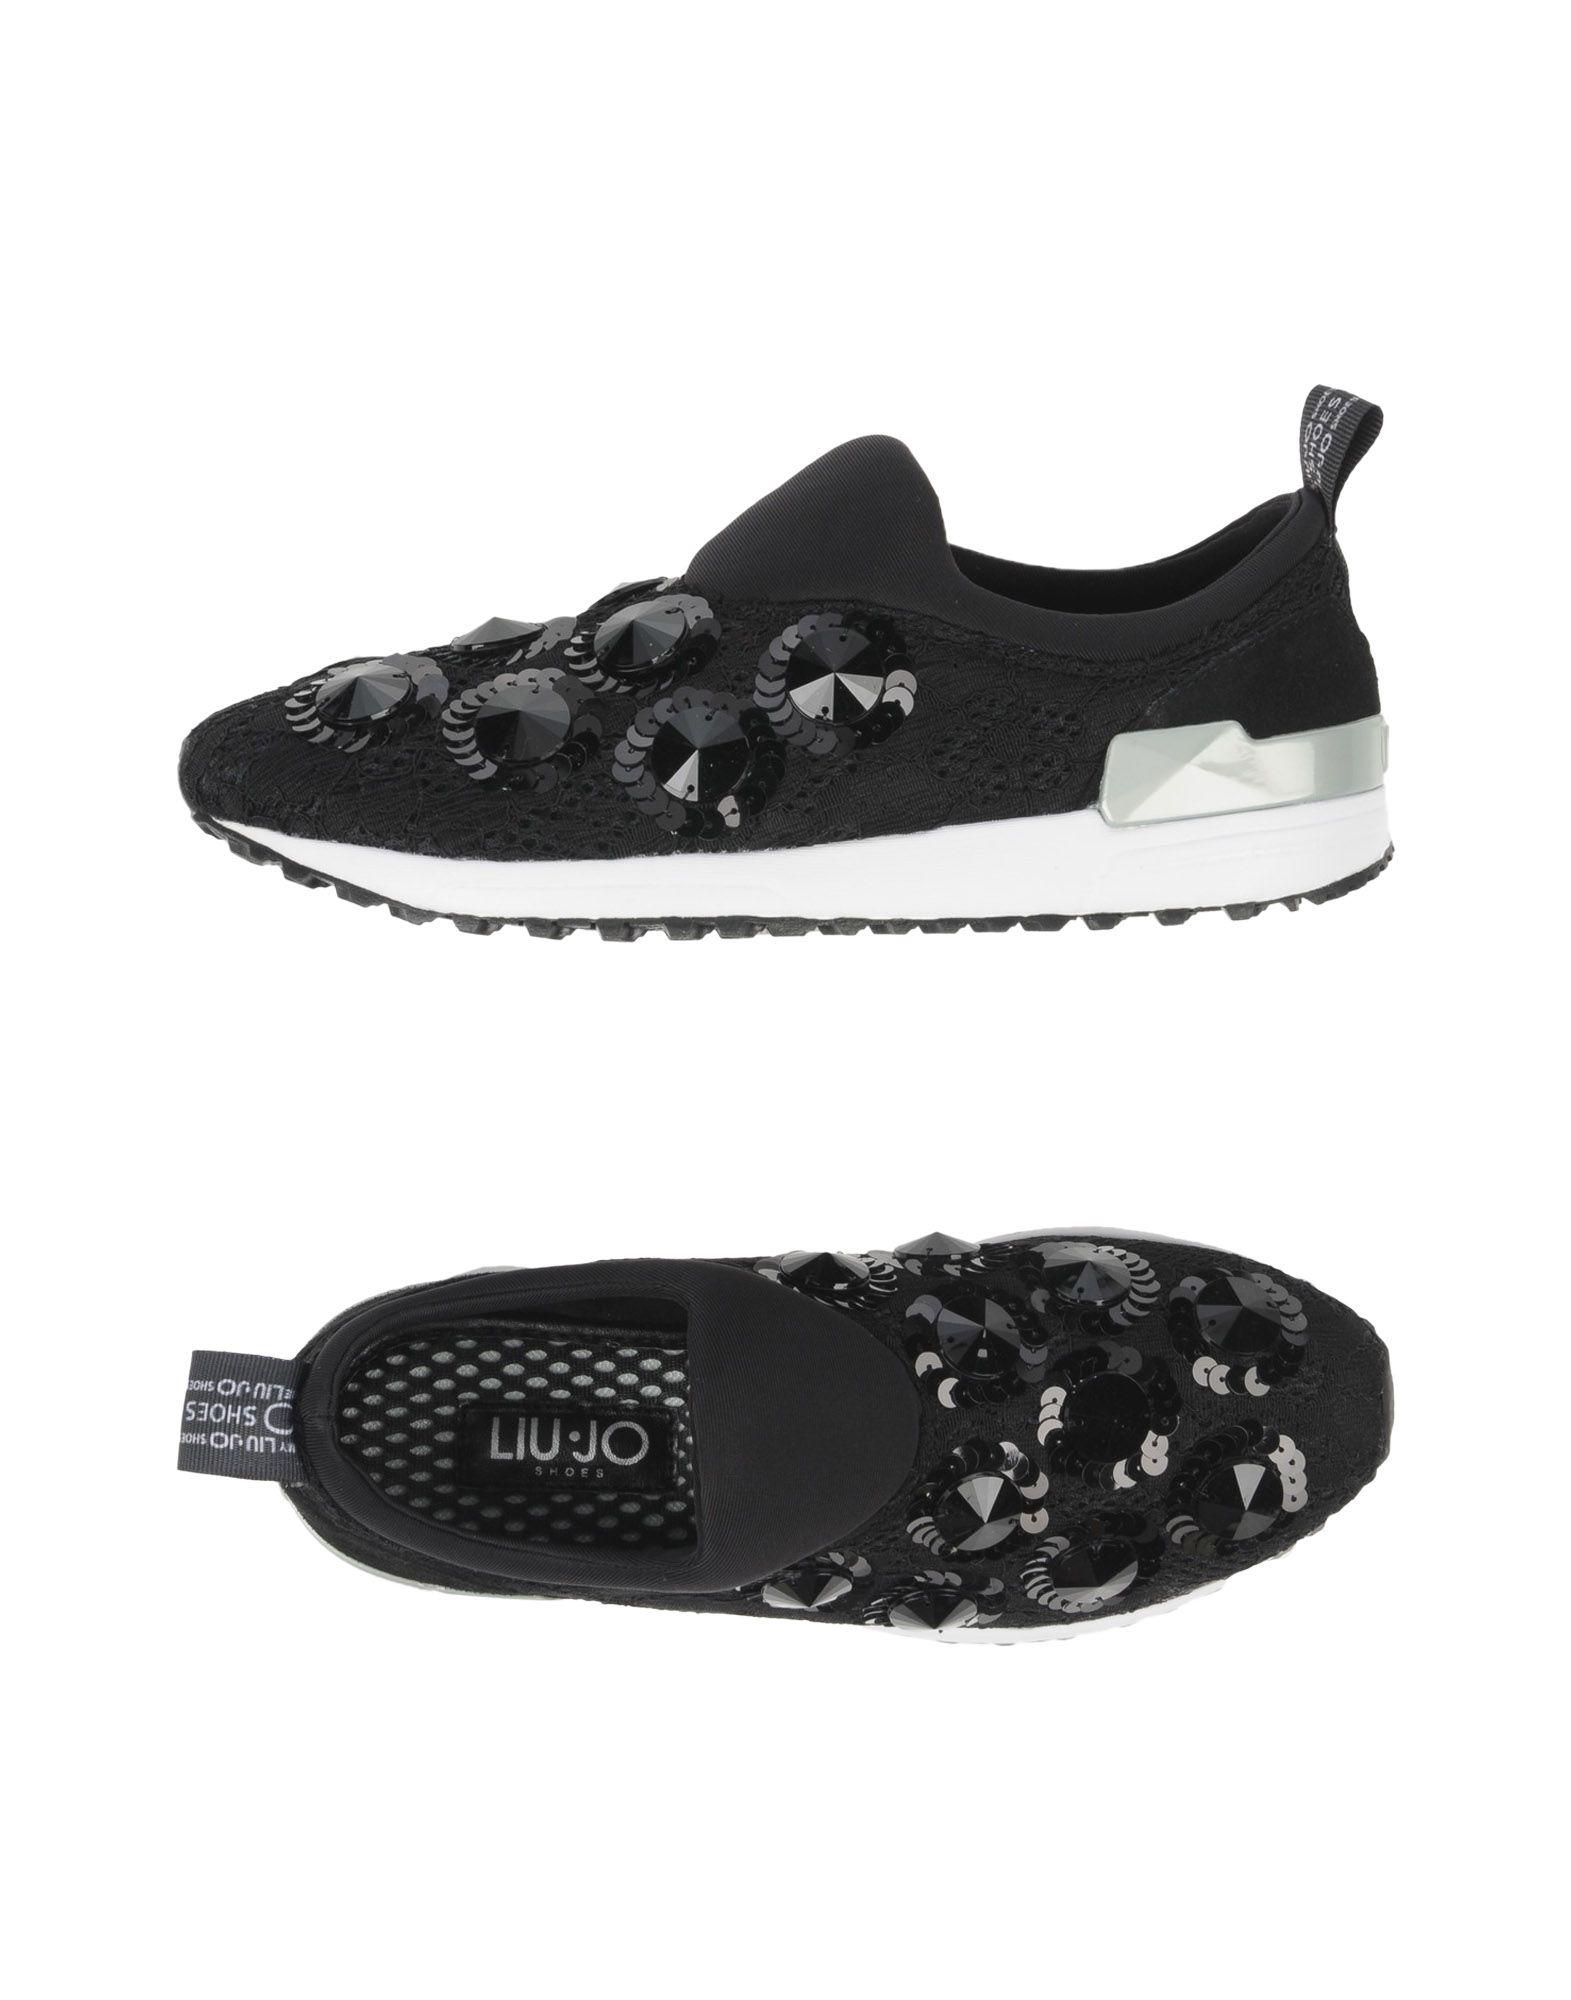 Liu •Jo Shoes Sneakers 11314916SM Damen  11314916SM Sneakers  26c6b0